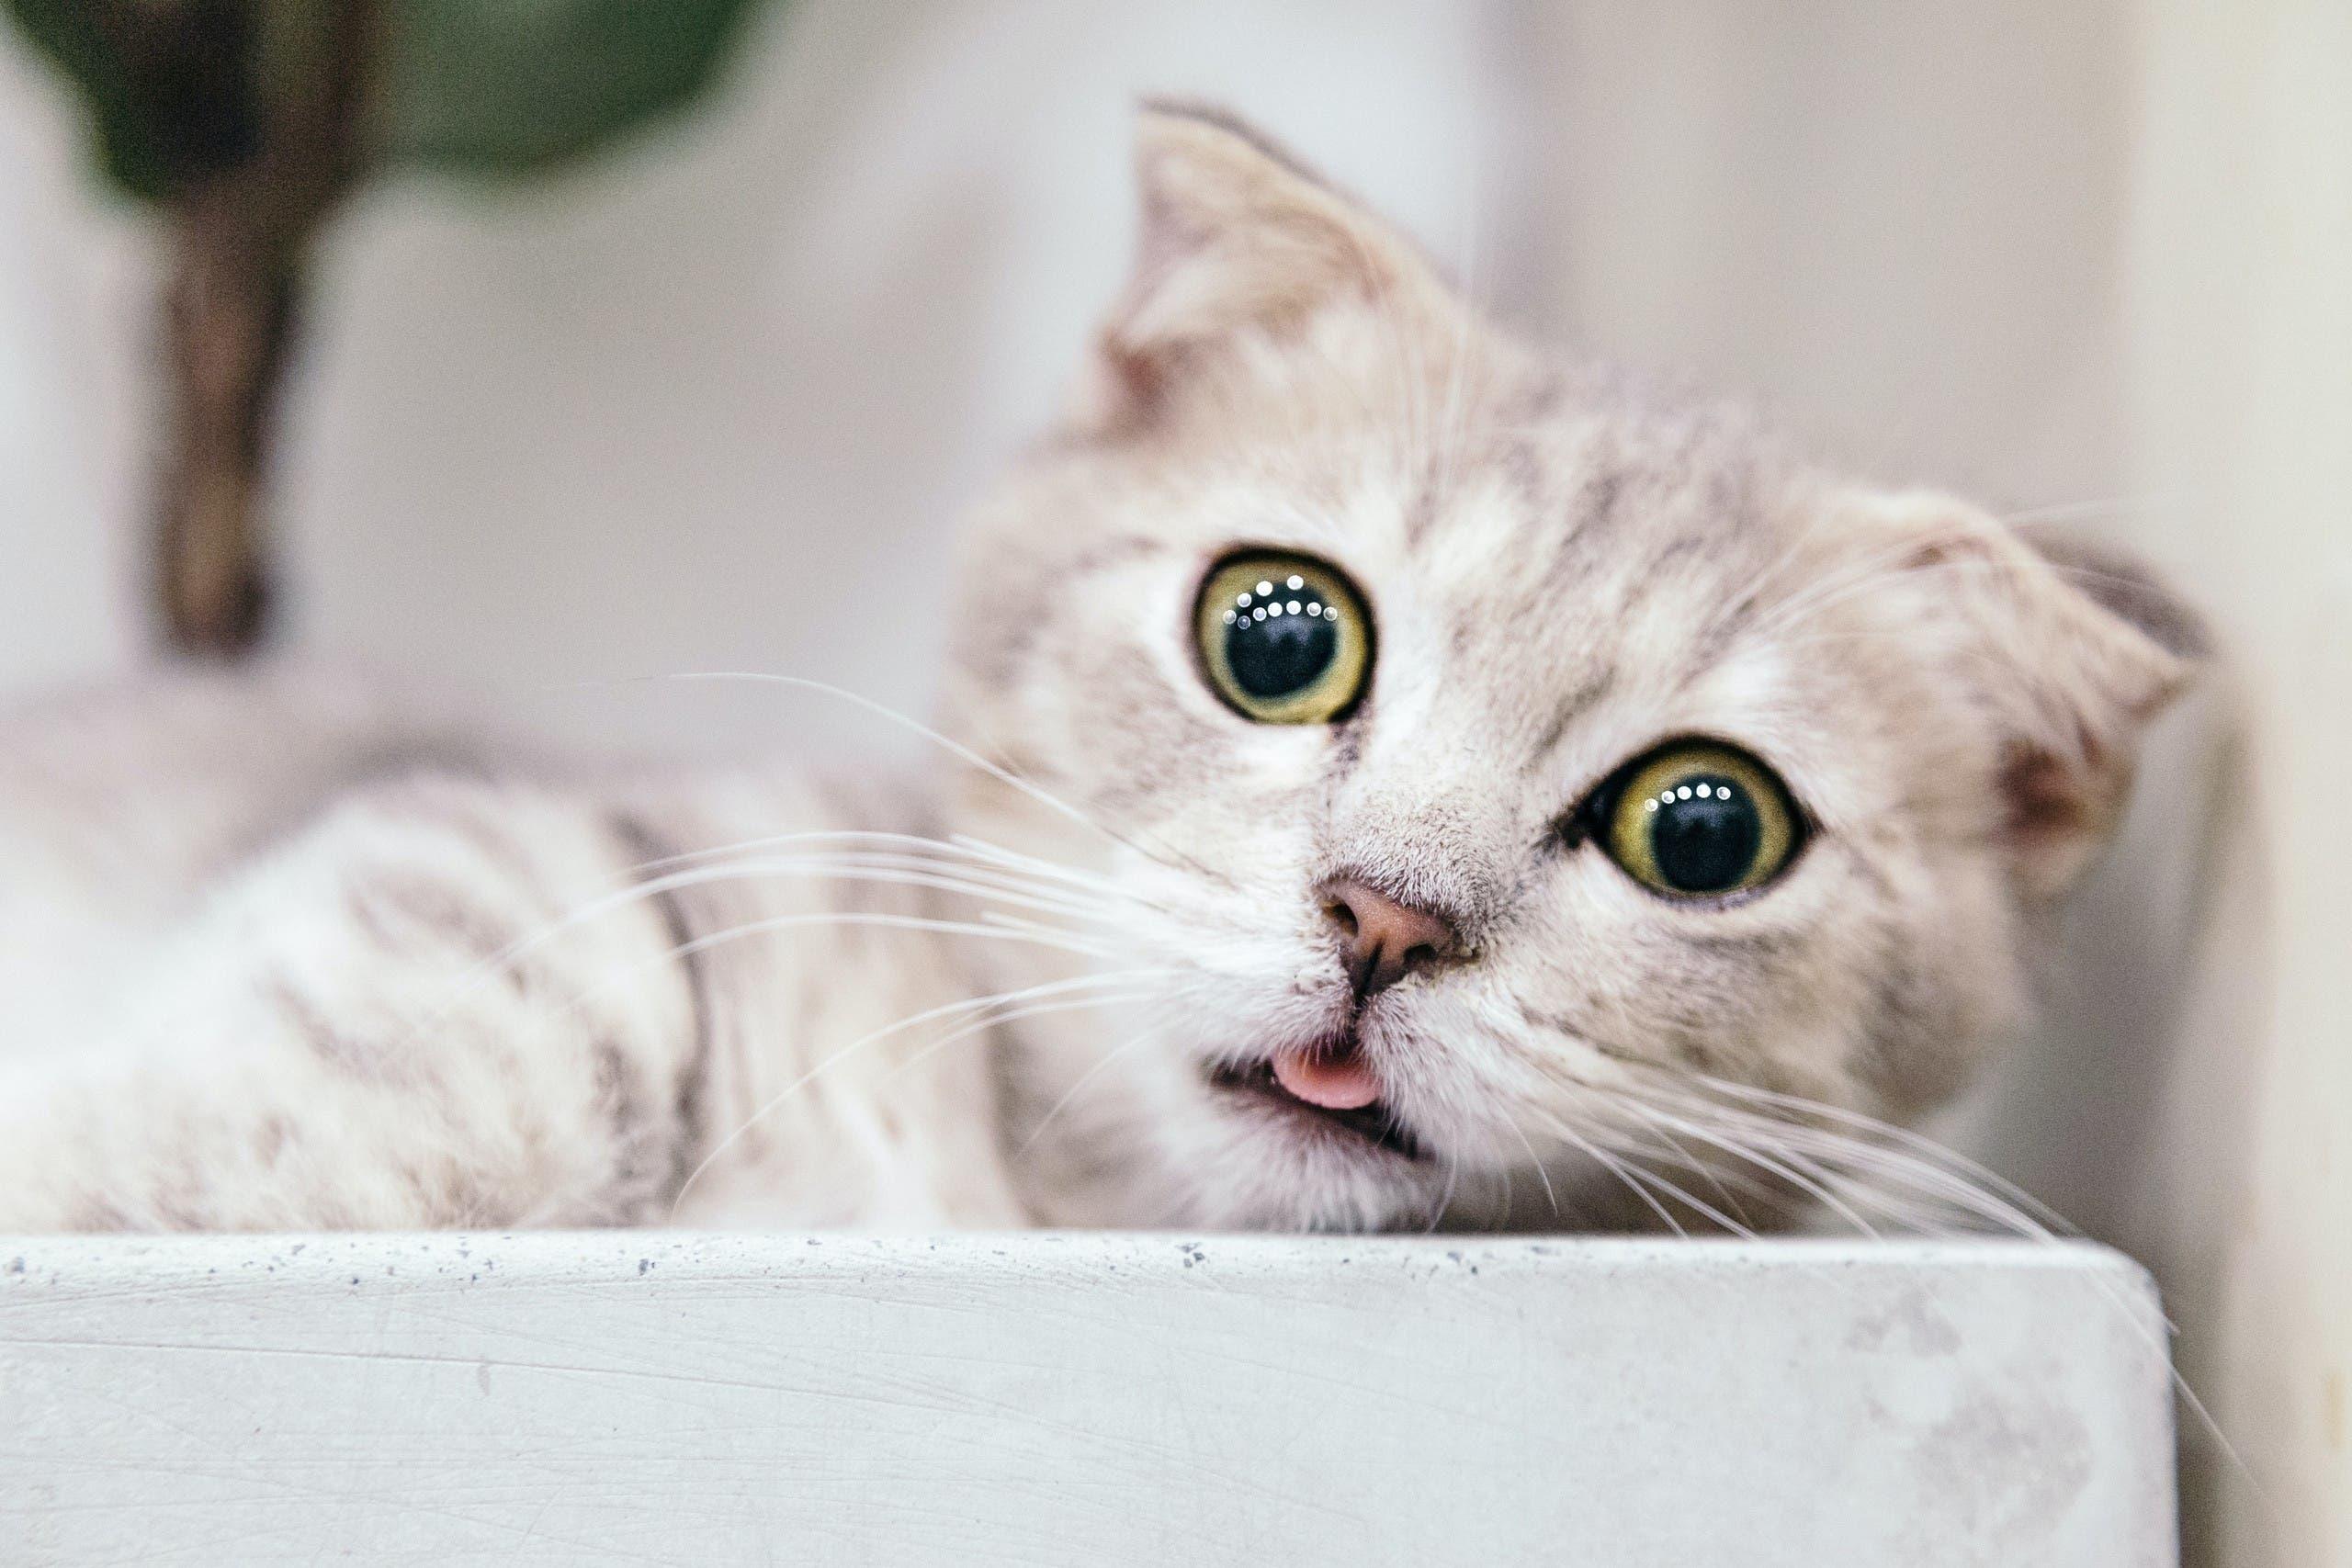 A stratled brown tabby cat. (Unsplash, Tran Mau Tri tam)